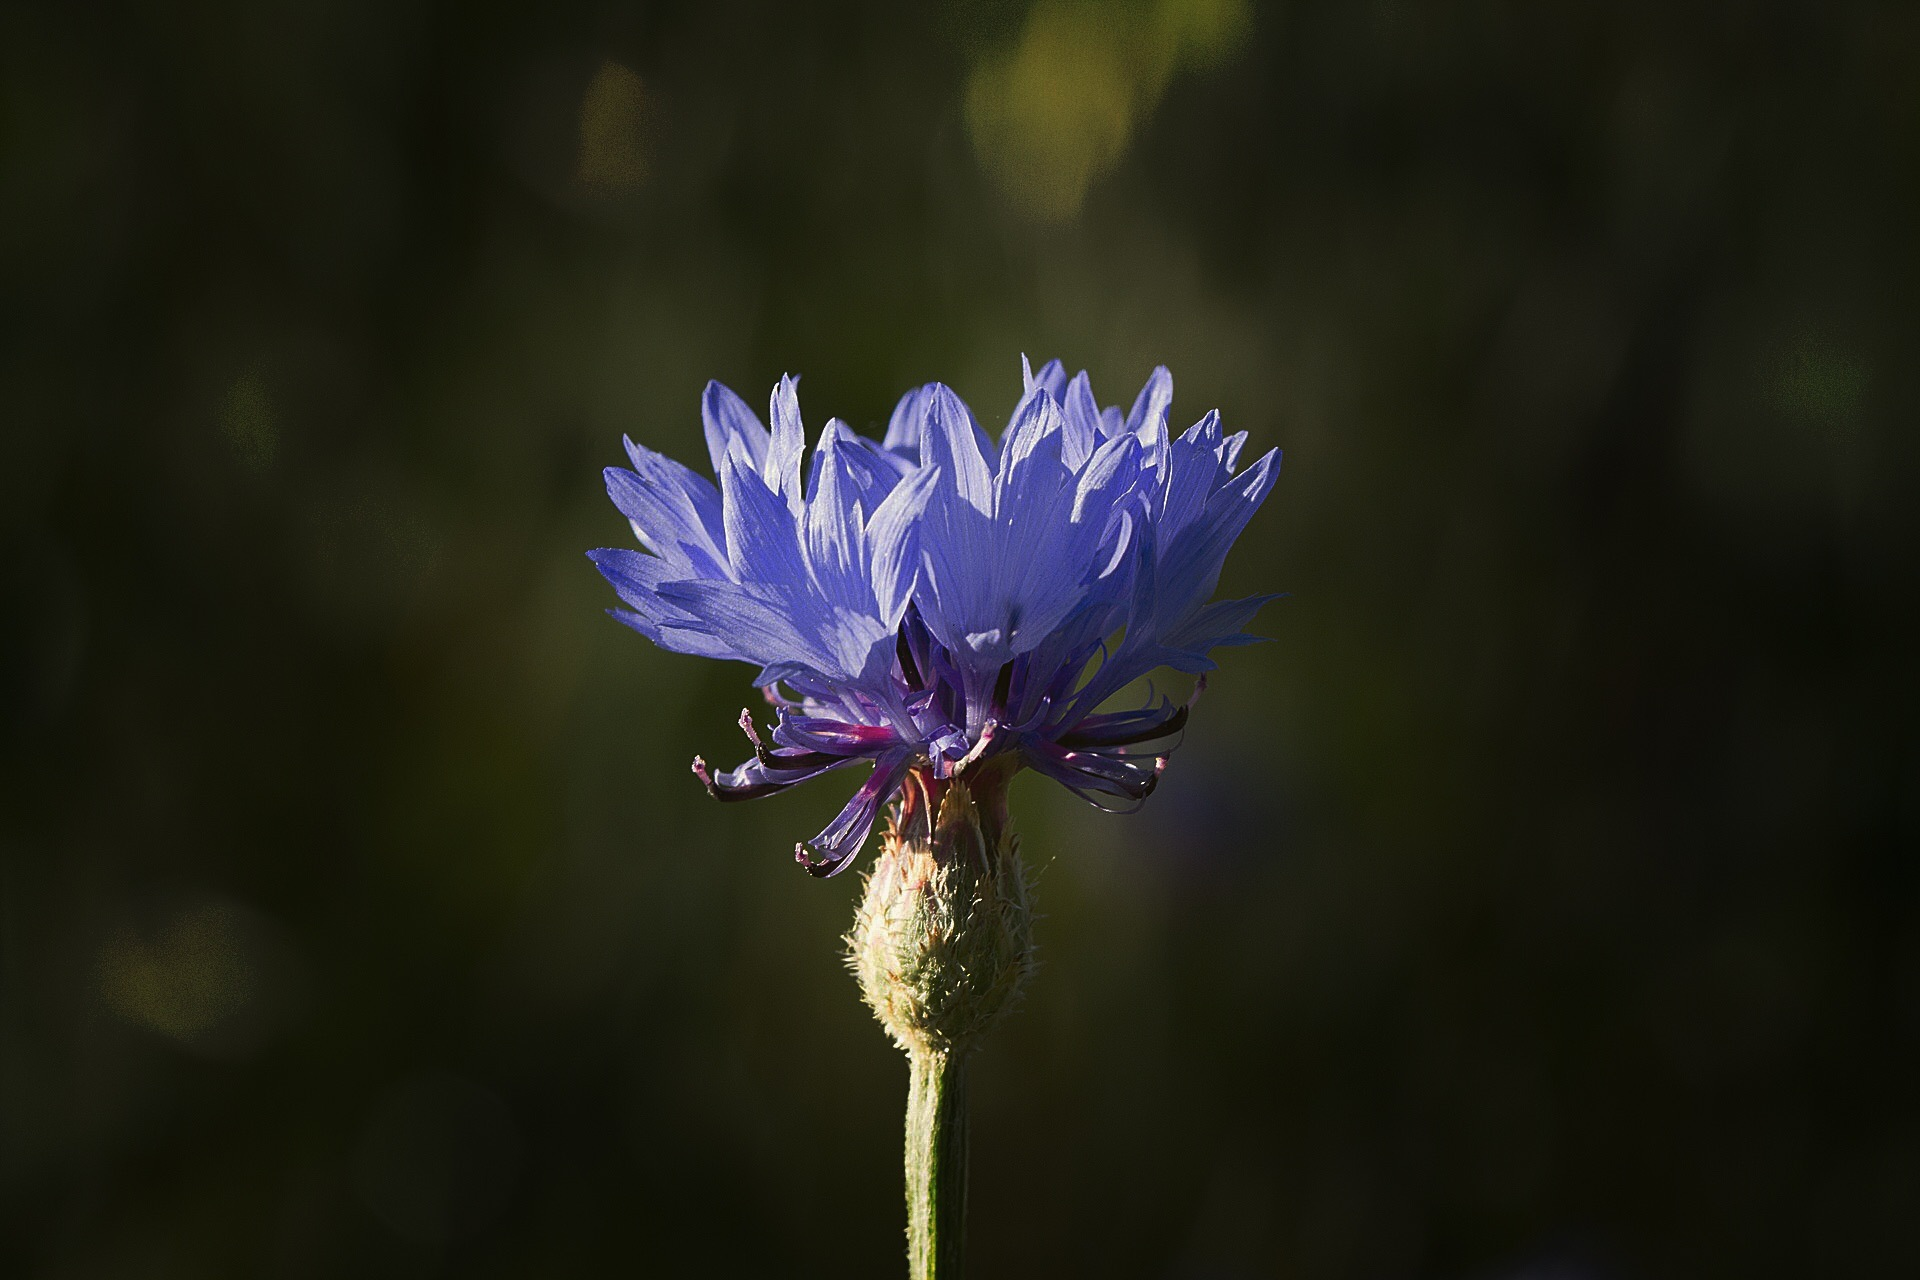 Cornflower  by Lsb23